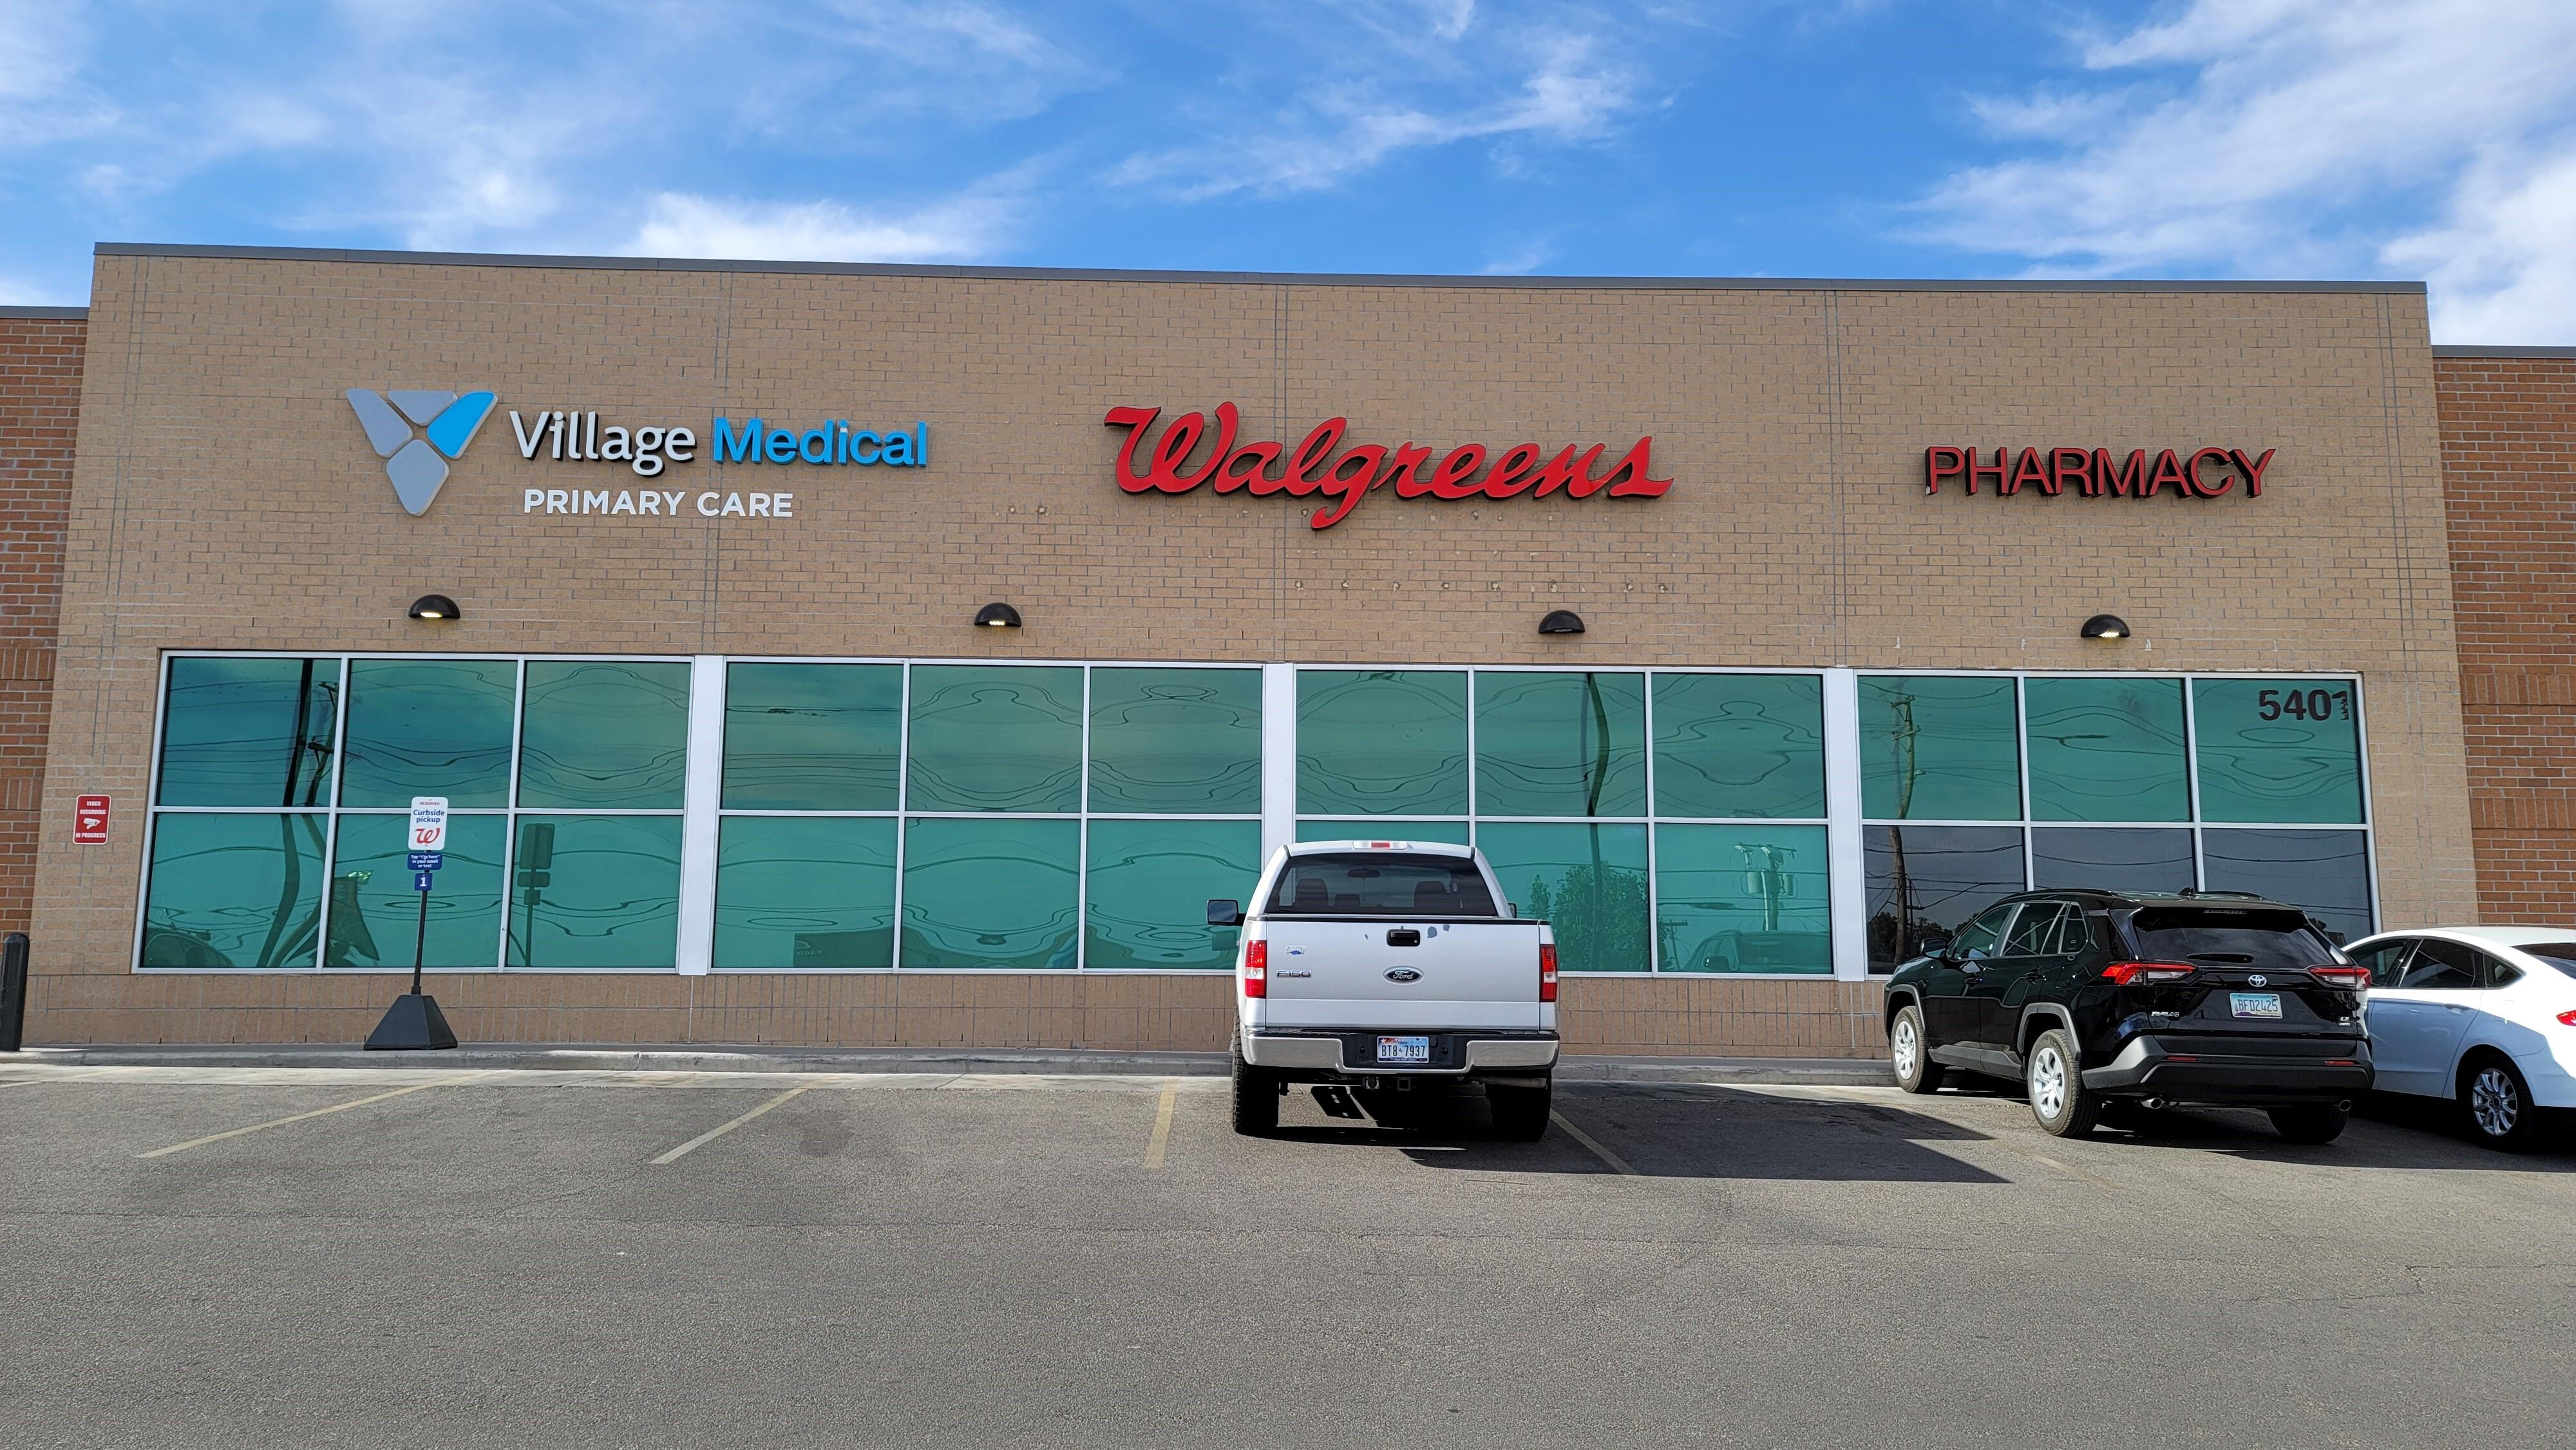 Village Medical at Walgreens - 5401 Montana Ave Suite B El Paso, TX 79903